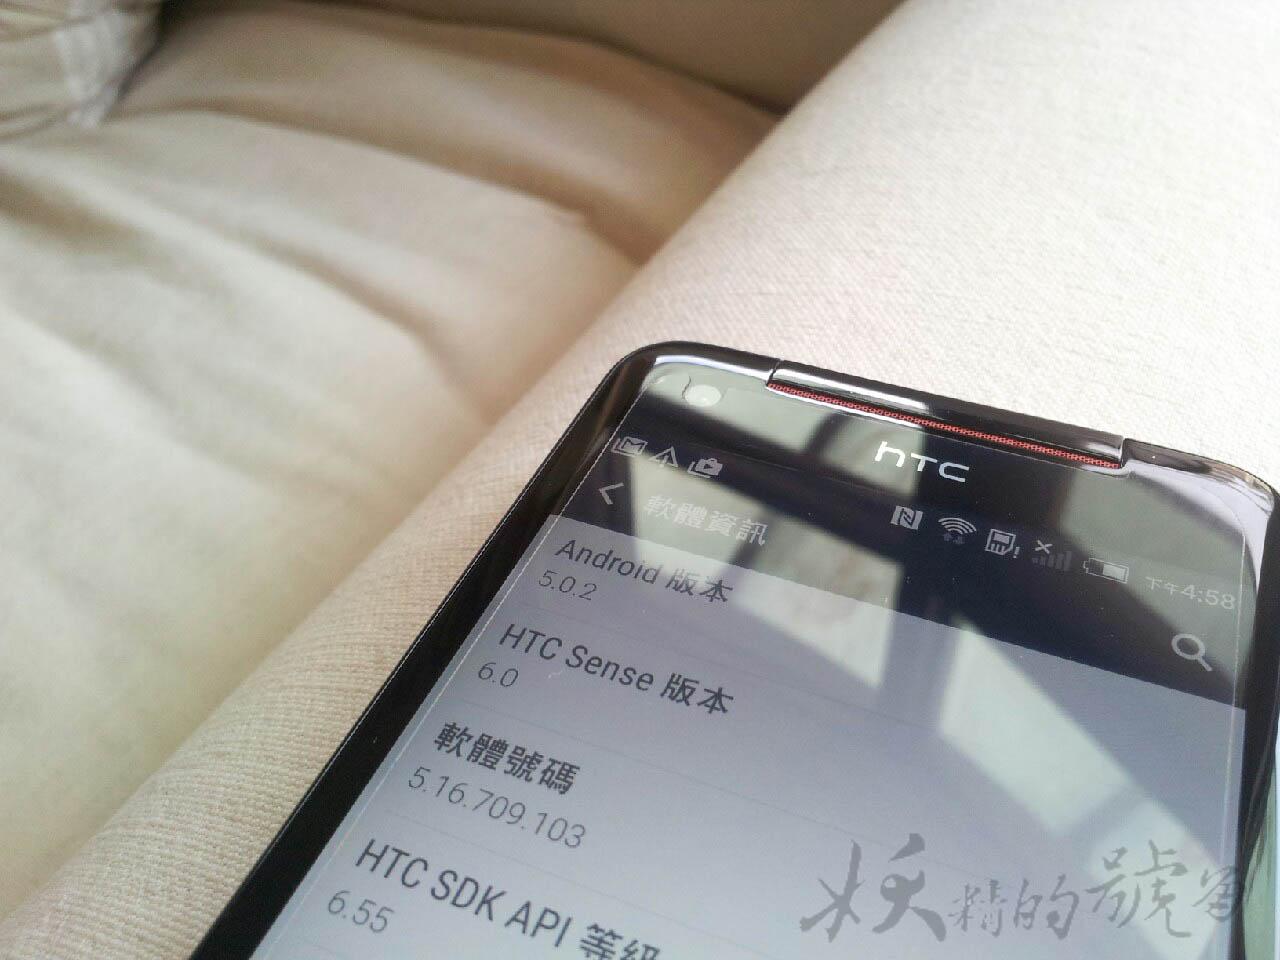 20150806 3827 - HTC Butterfly S 相機紫光 - 過保維修記(已s-off + Unlocked)